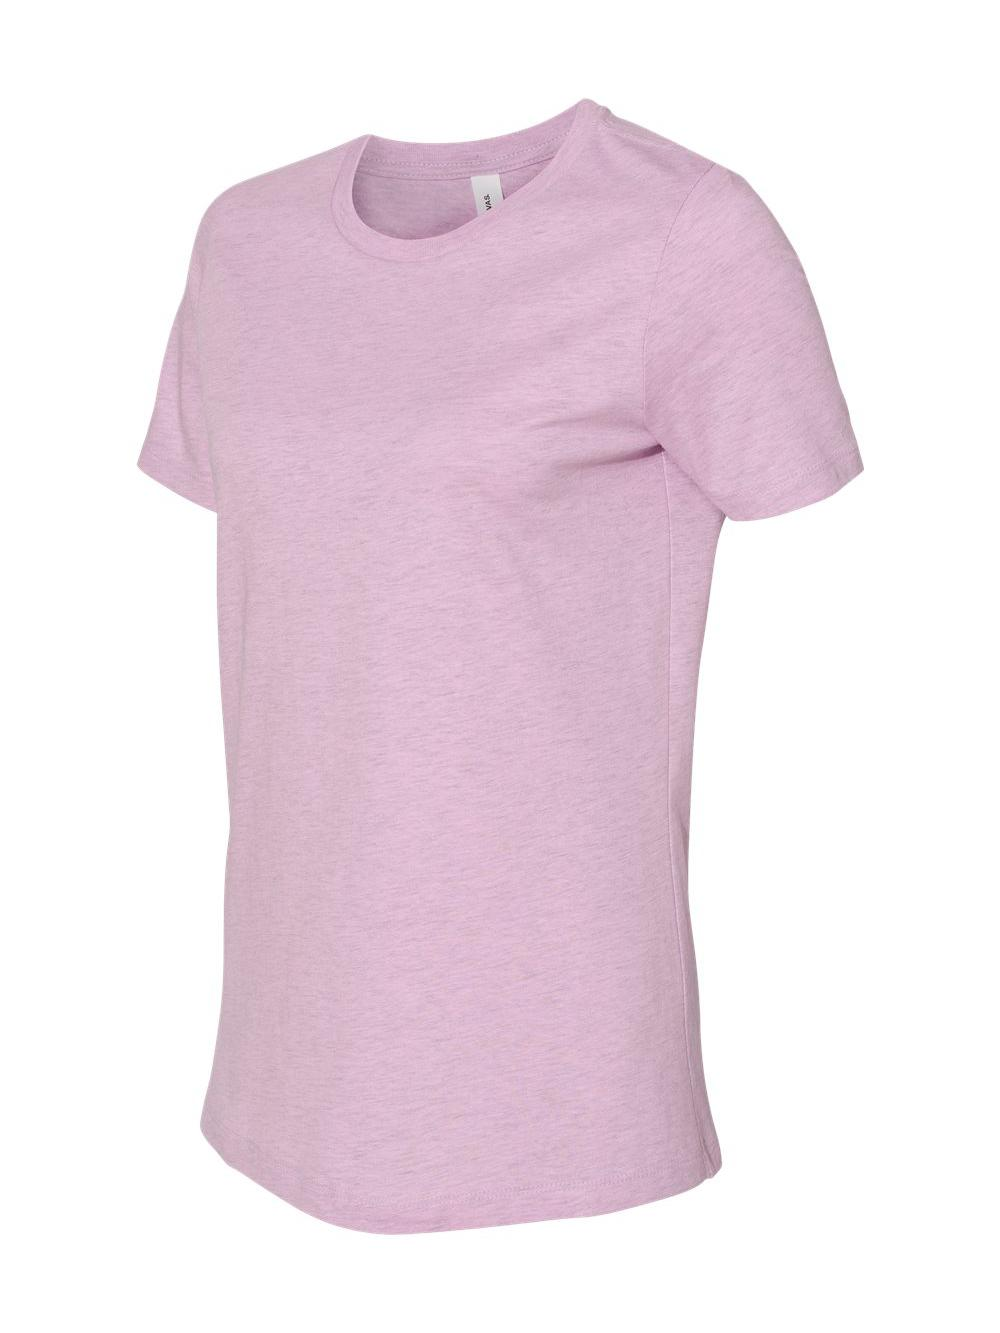 Bella-Canvas-Women-039-s-Relaxed-Short-Sleeve-Jersey-Tee-6400 thumbnail 44